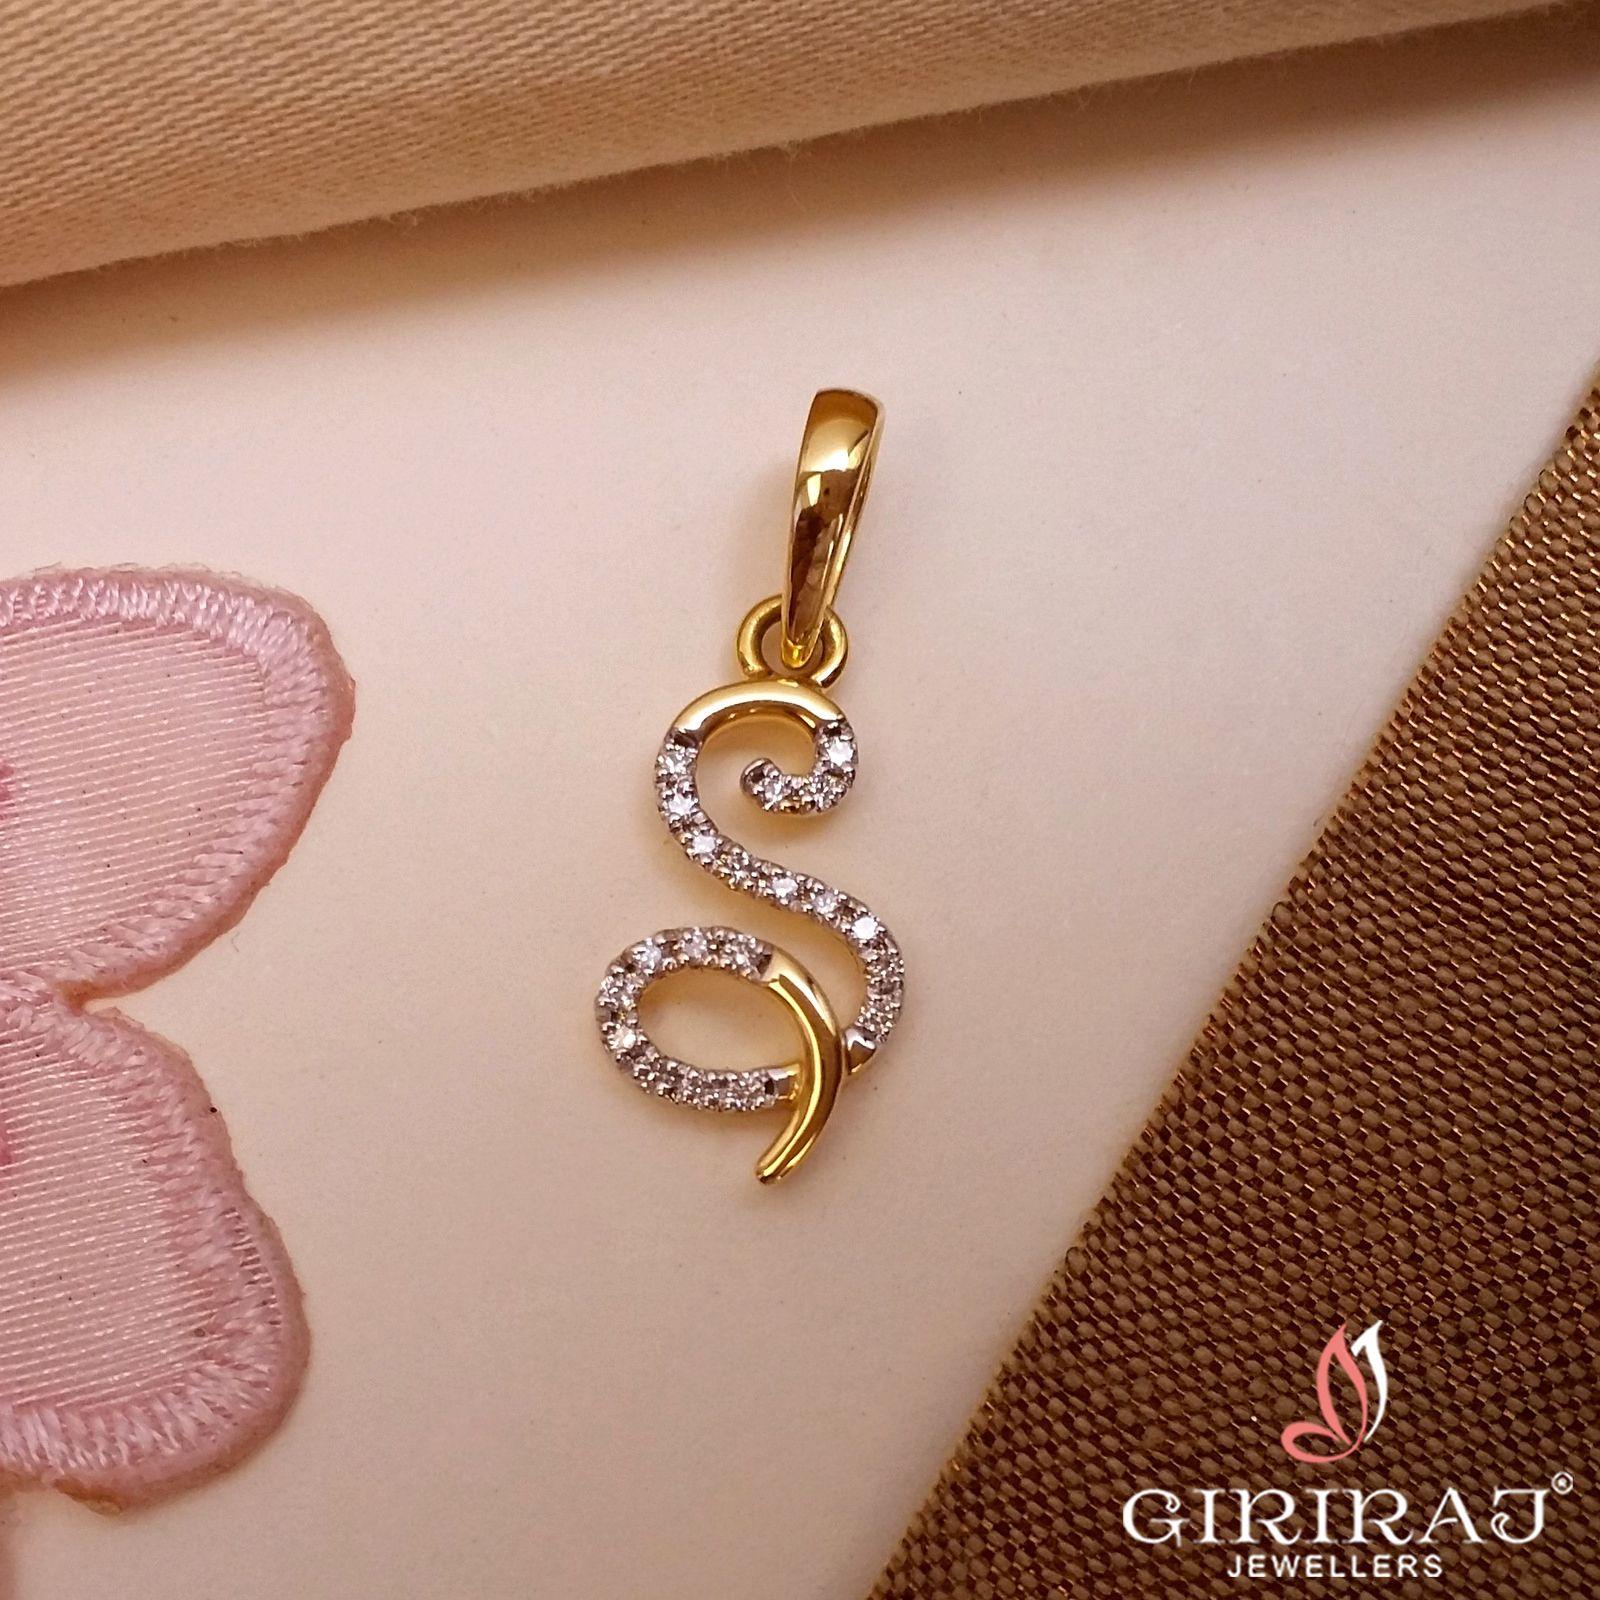 18k Diamond Alphabet S Pendant Girirajjewellers Co In Gold Pendant Jewelry Handmade Gold Jewellery Silver Jewelry Accessories